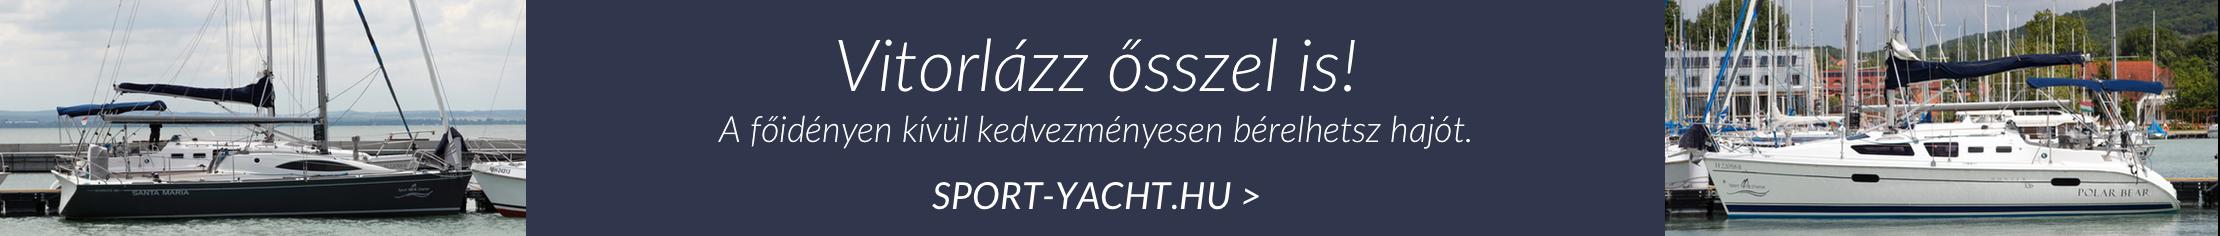 Bérelj vitorlást a sport-yacht.hu-n!